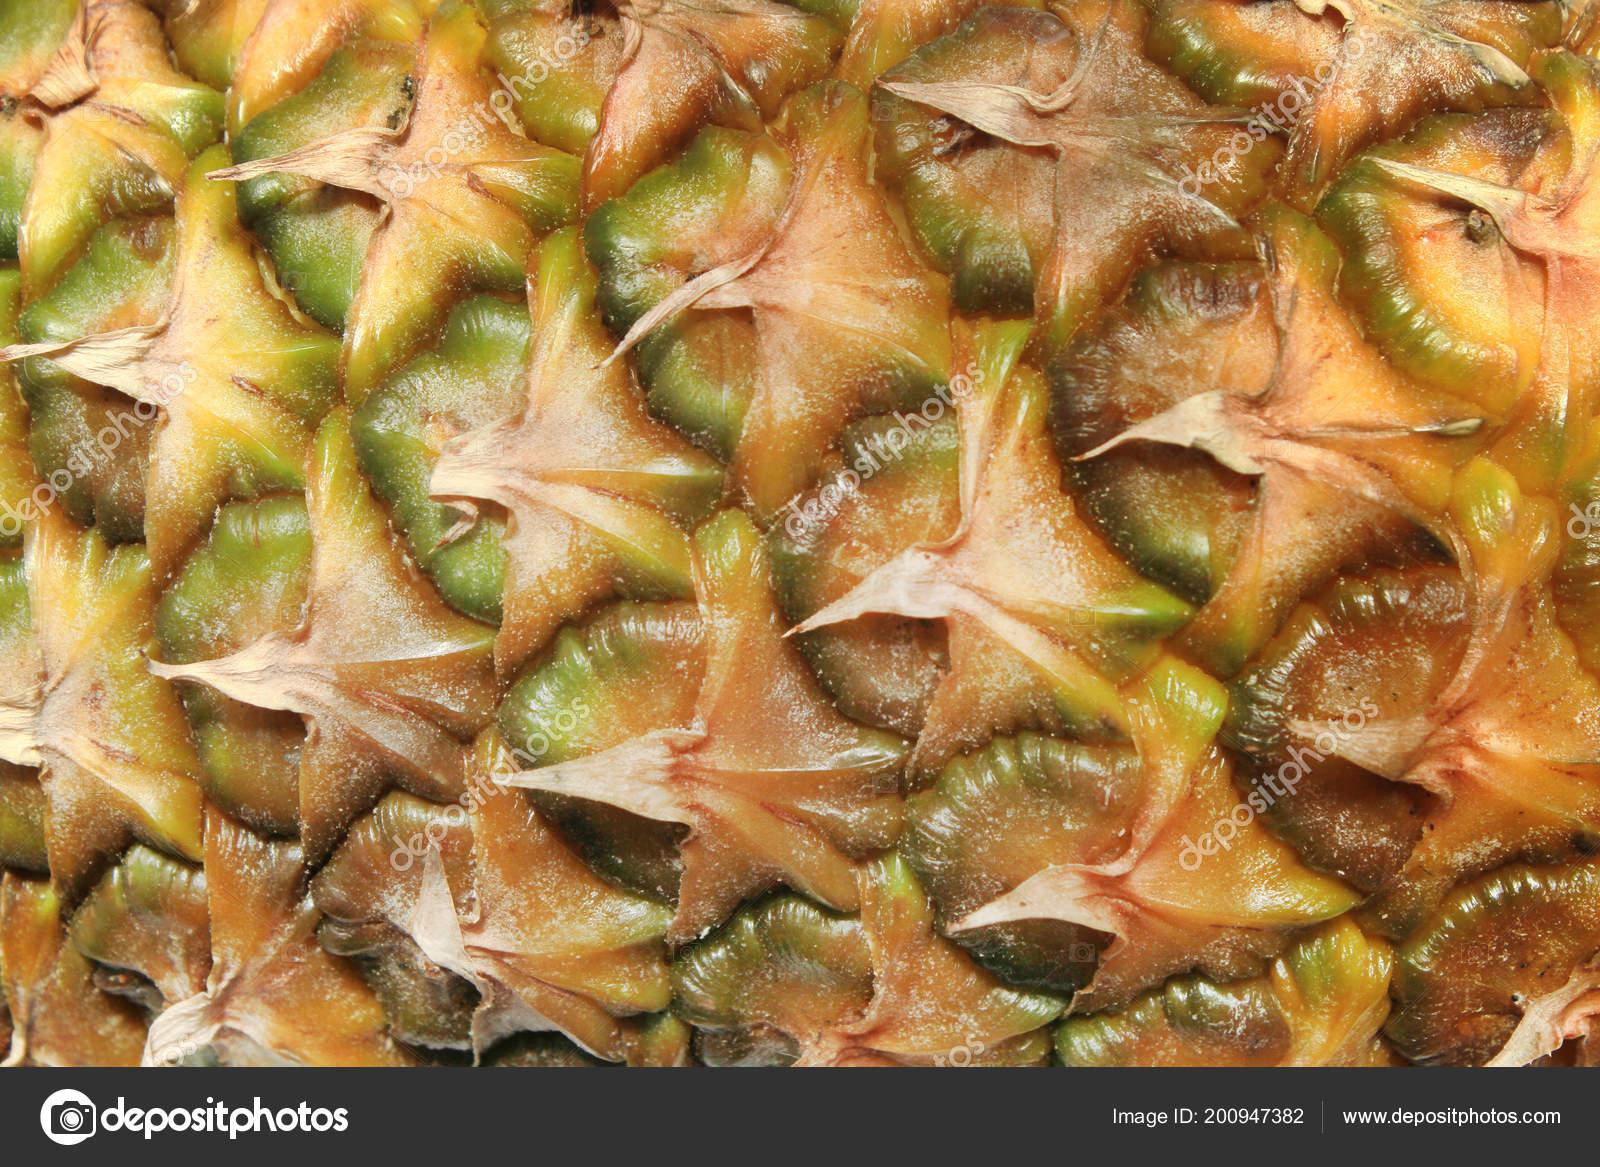 depositphotos 200947382 stock photo pineapple skin texture closeup pineapple